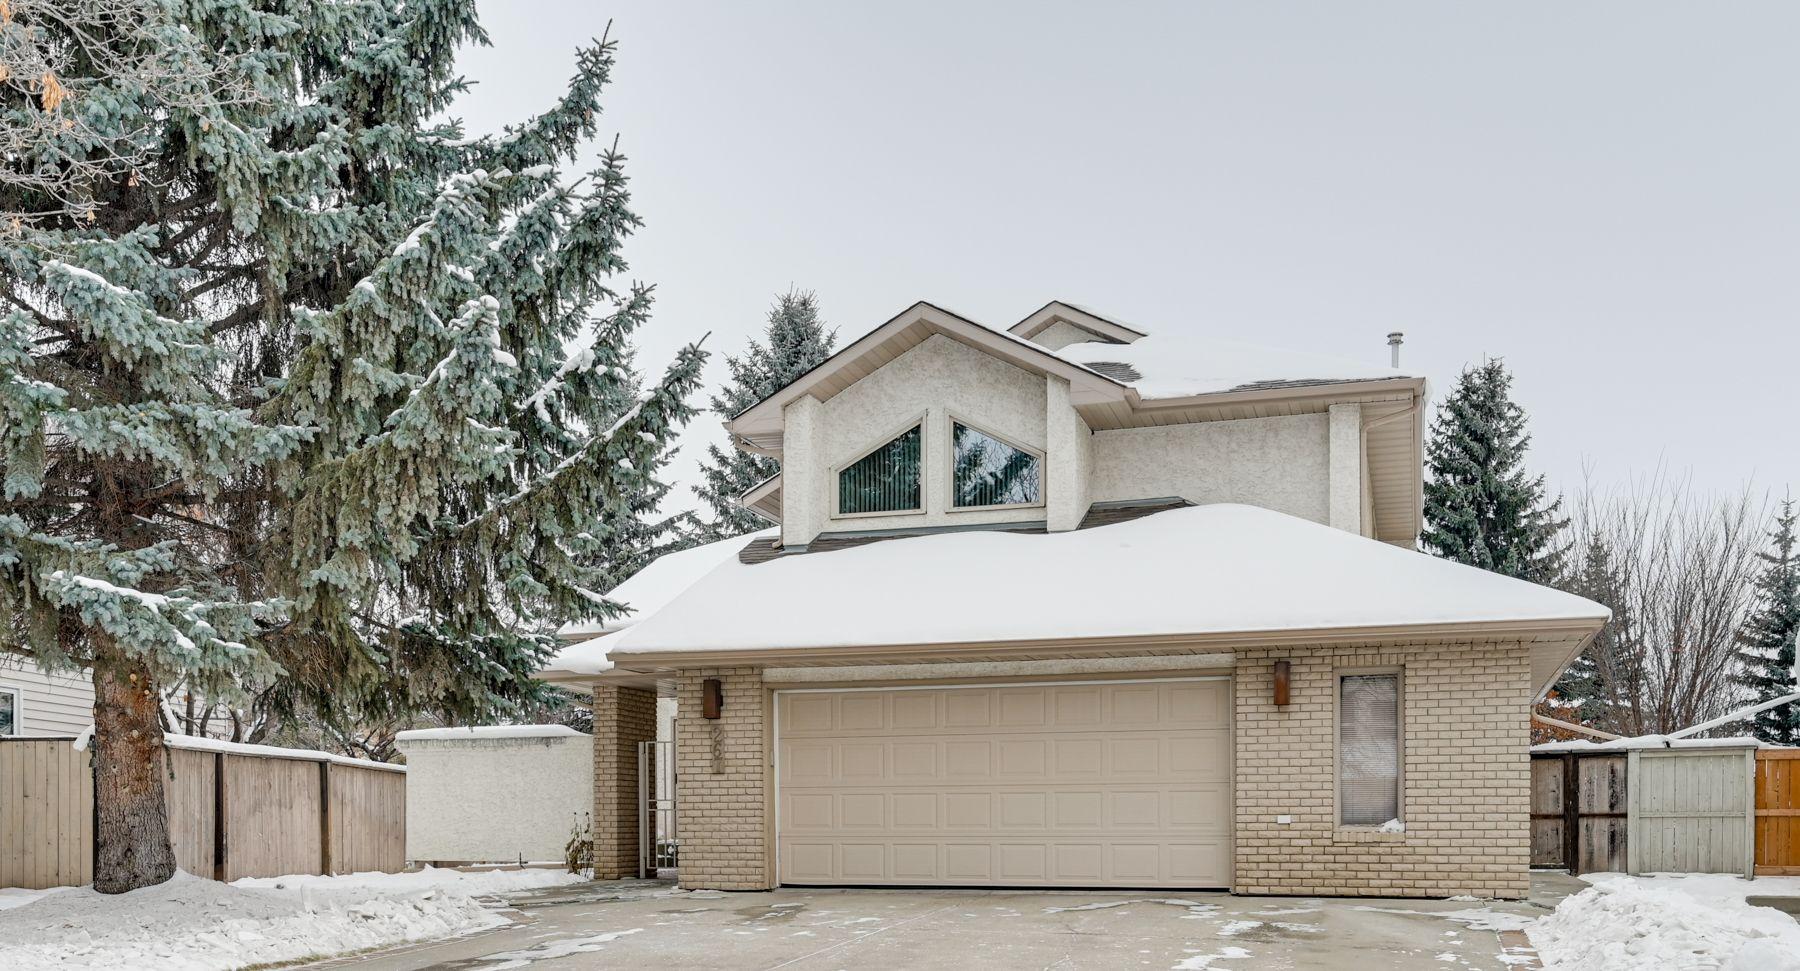 Main Photo: 267 Heagle Crescent in Edmonton: House for sale